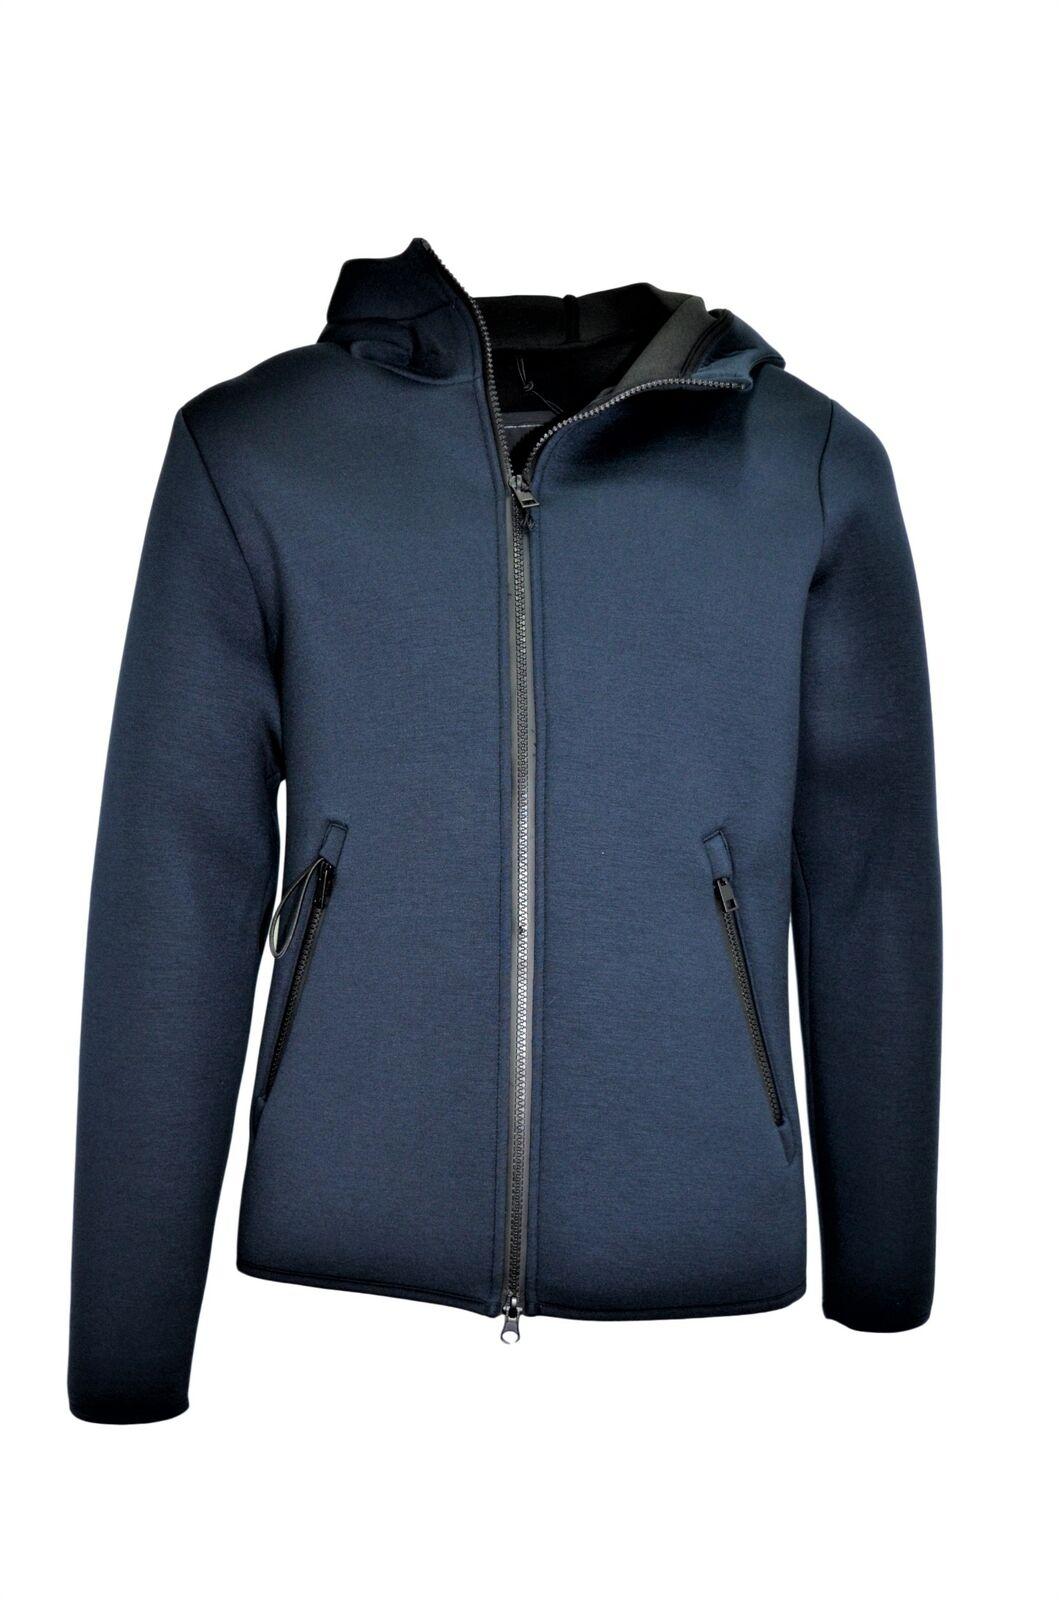 Hox Jacke Mann Neoprene Modell XU3536 Farbe Dark Blau Reißverschluss und Kapuze